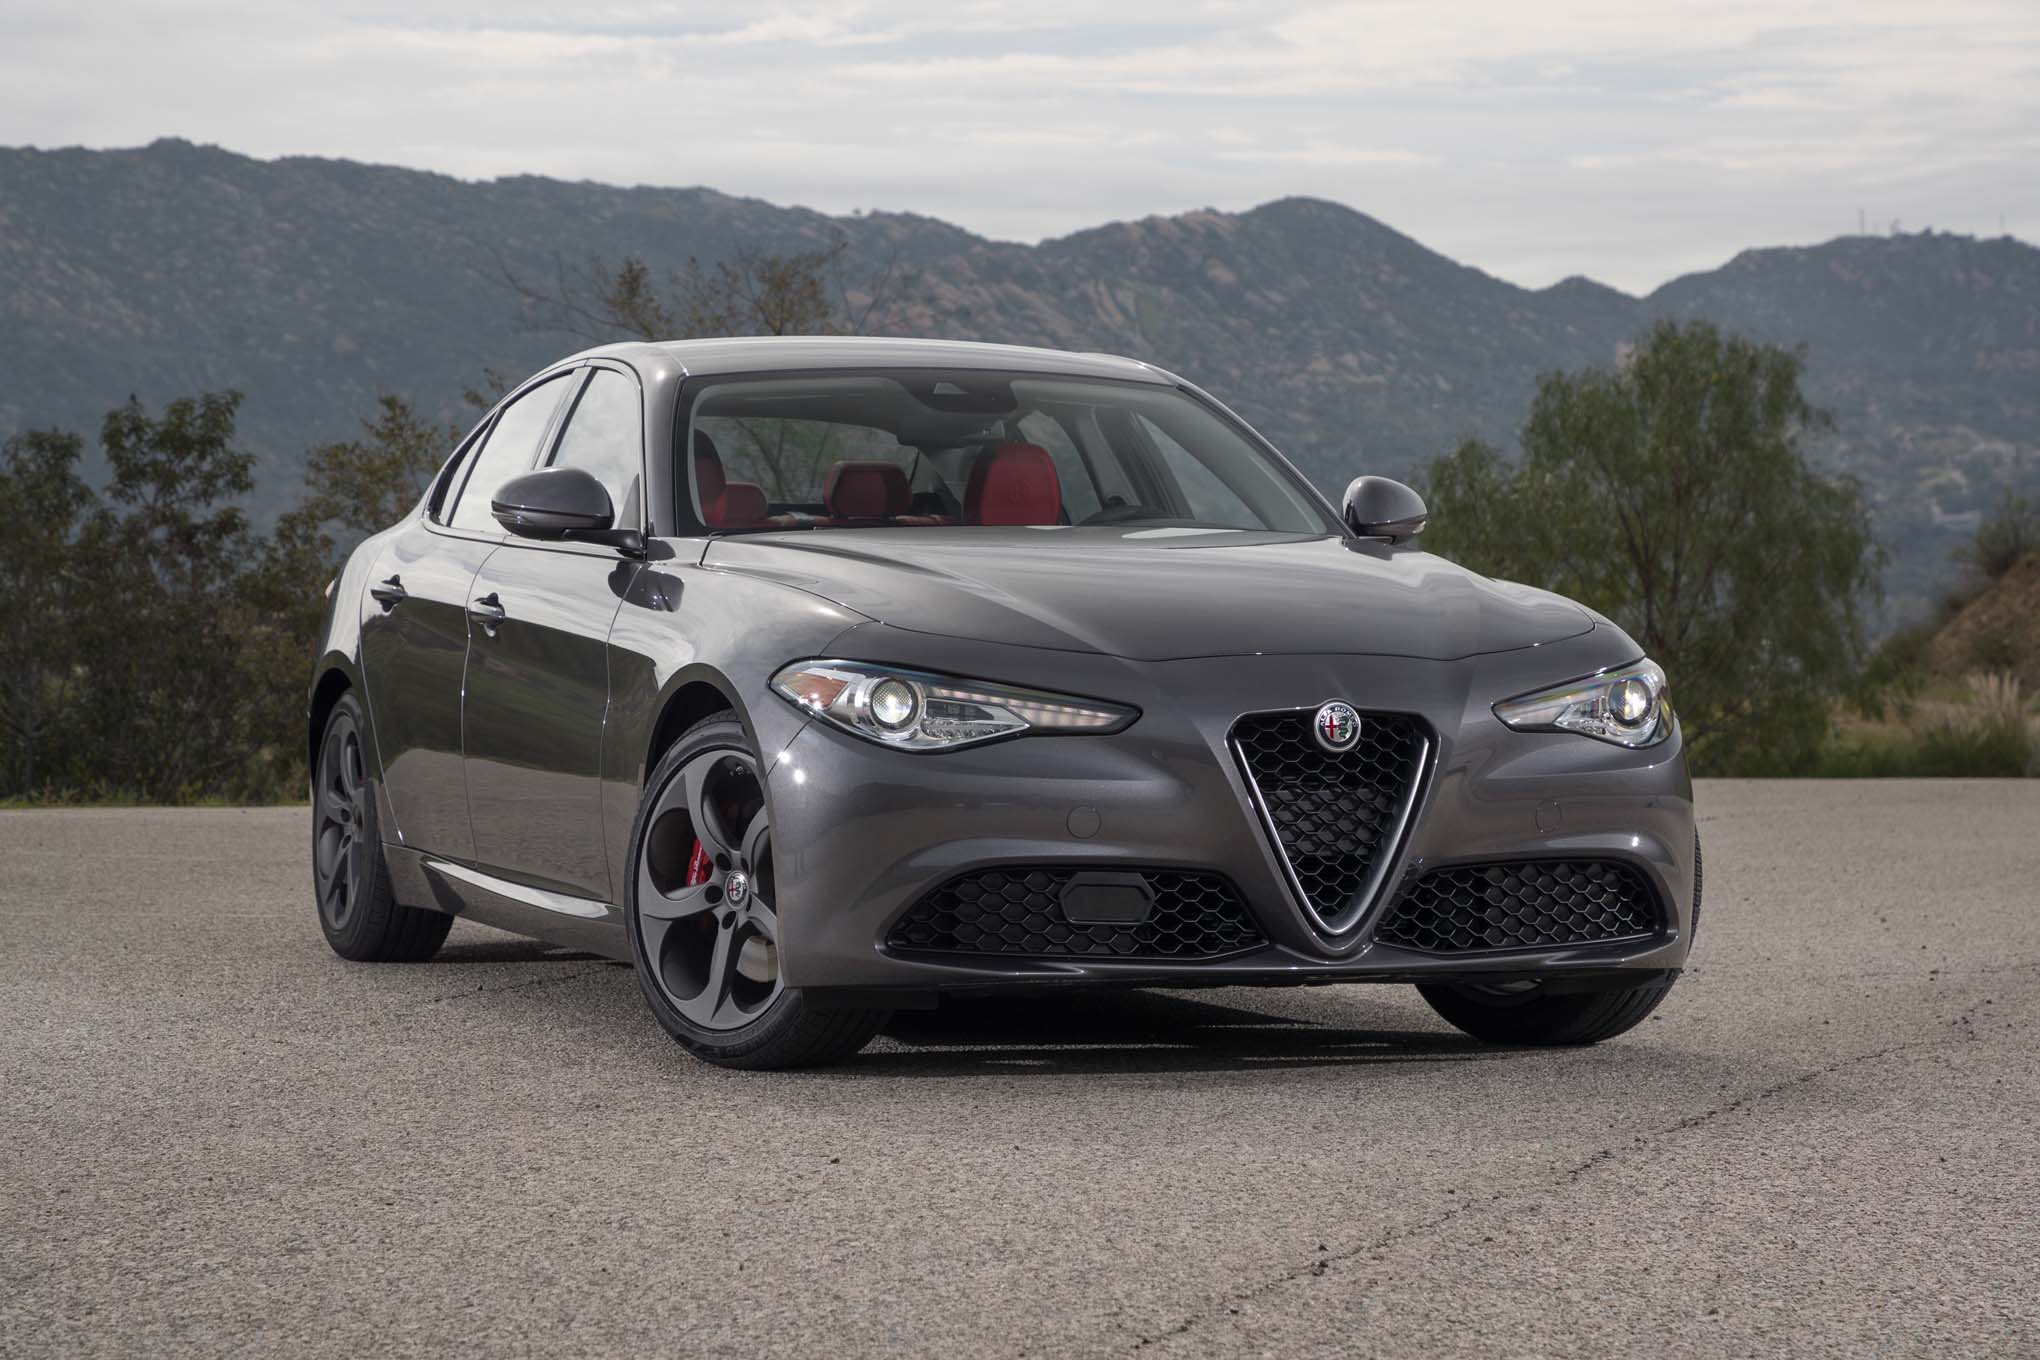 2017 Alfa Romeo Giulia 20 front three quarter